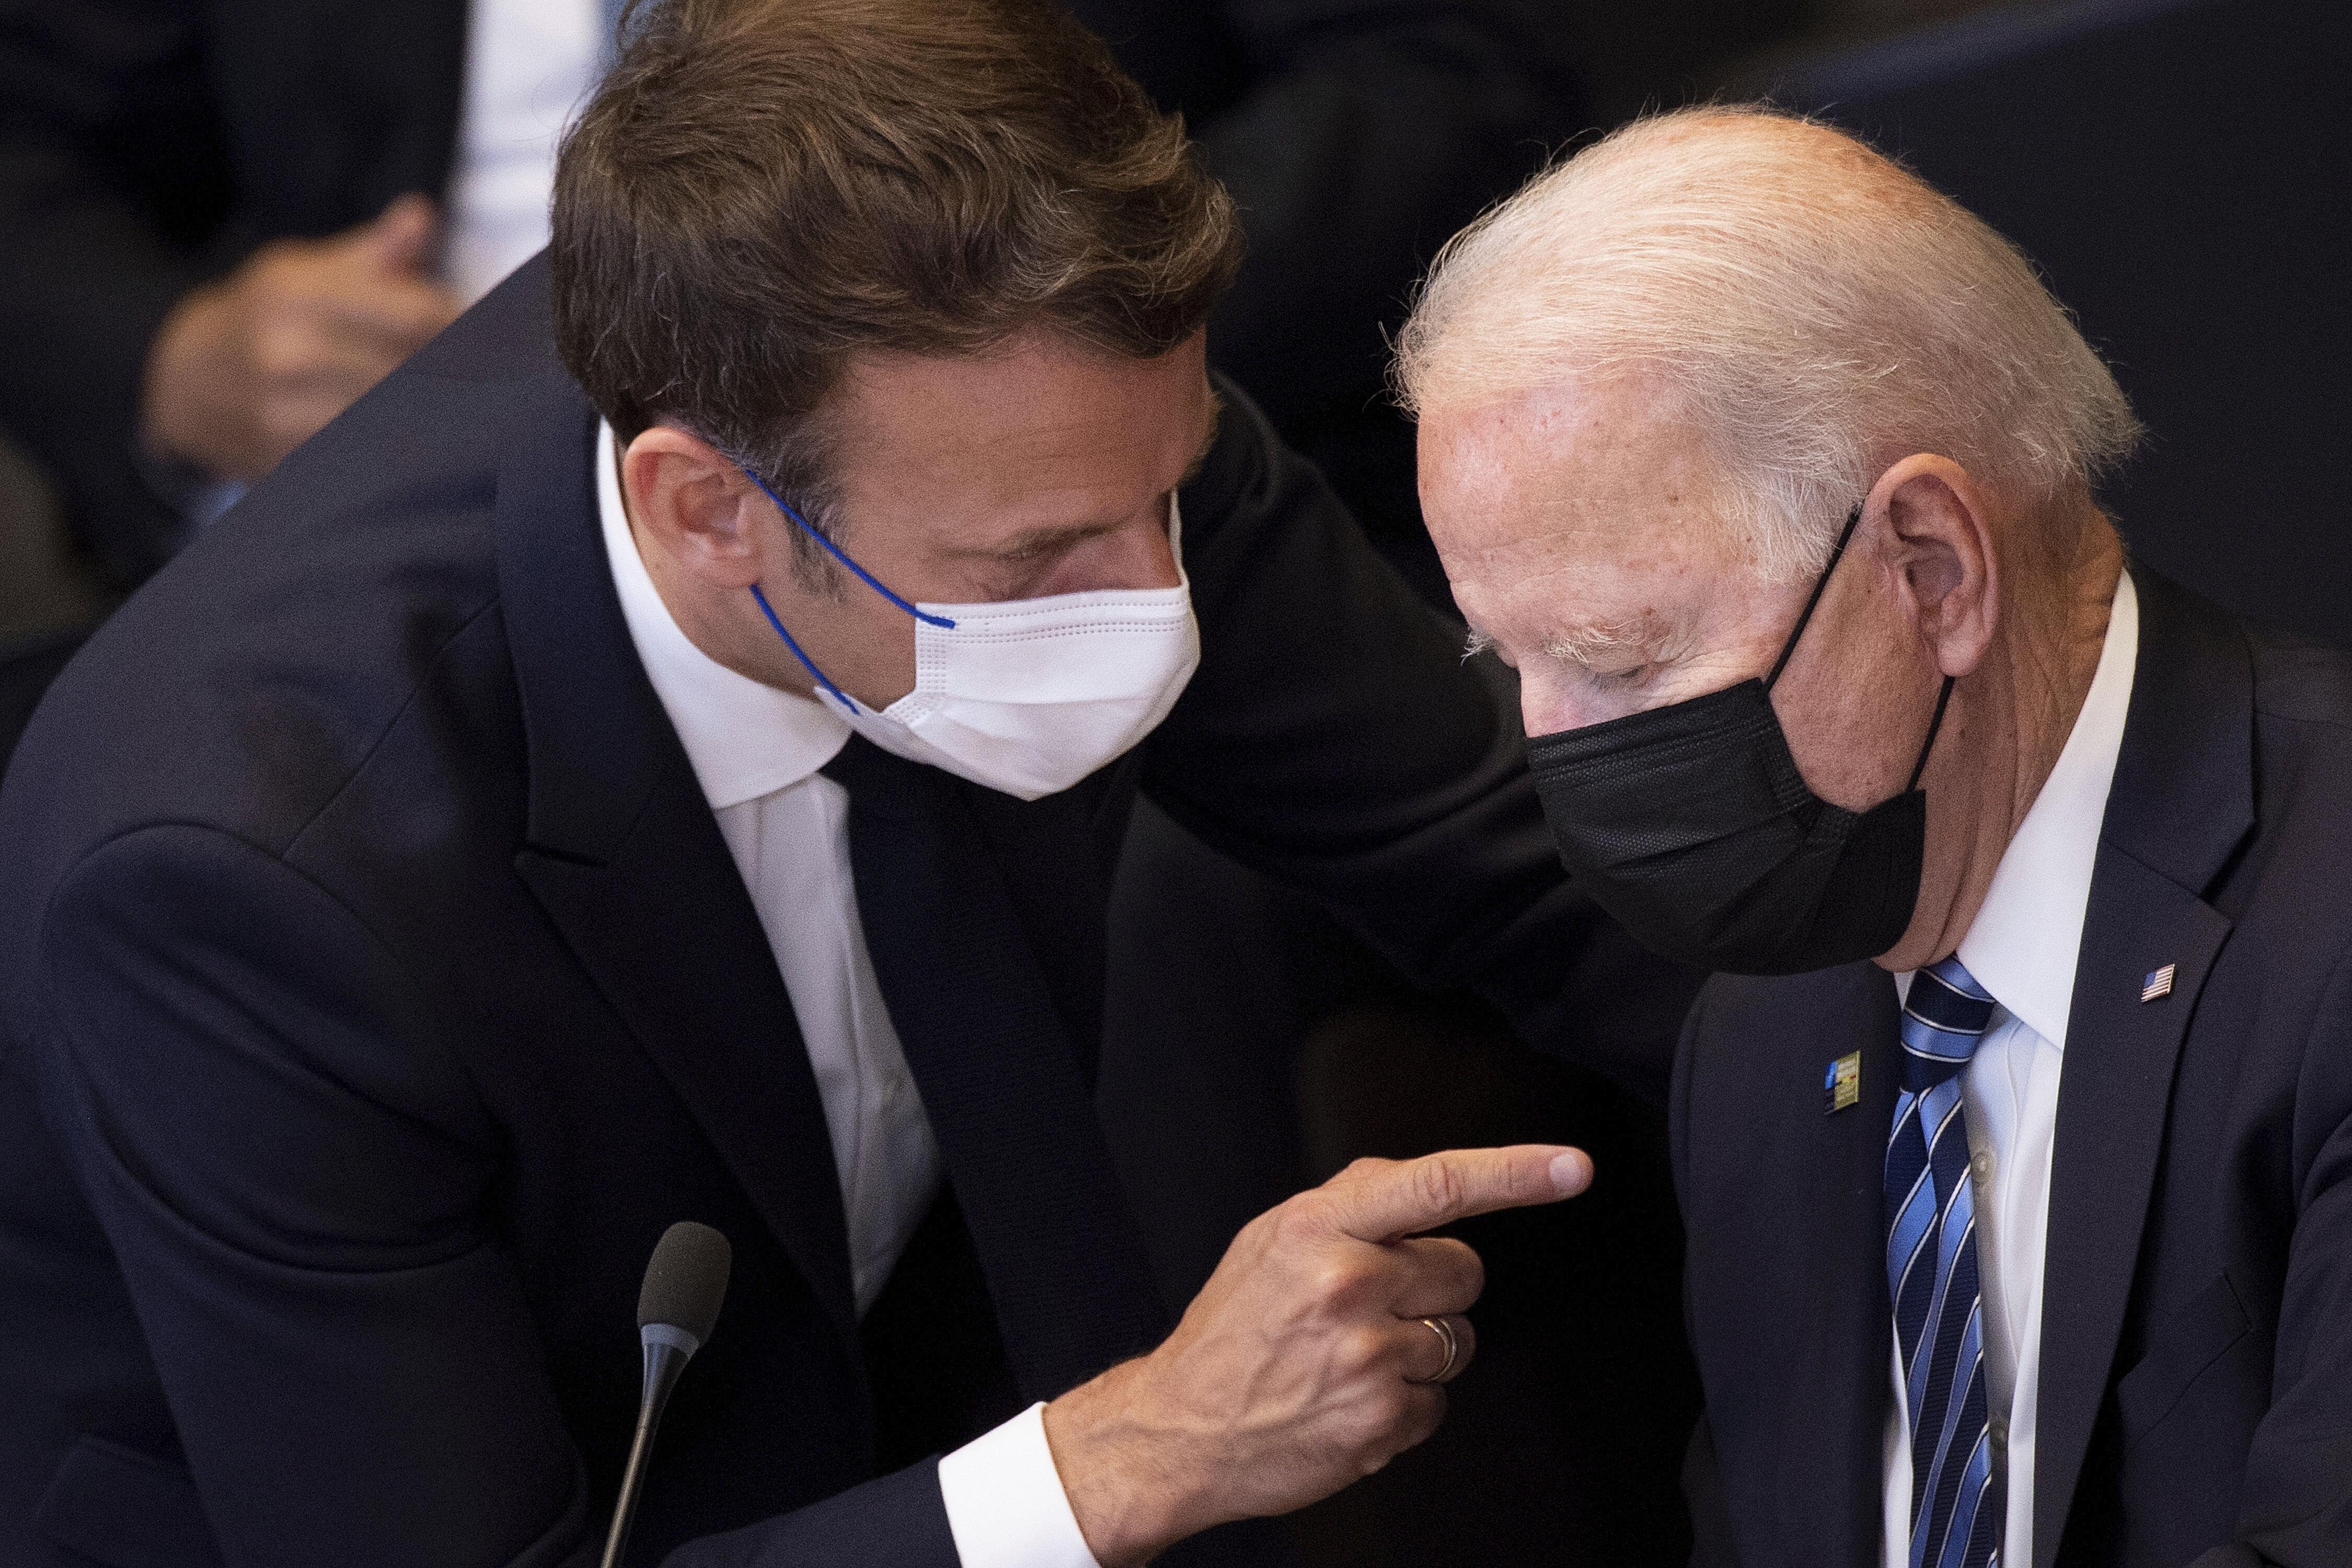 US President Joe Biden, right, speaks with French President Emmanuel Macron during a NATO summit back in June 2021.